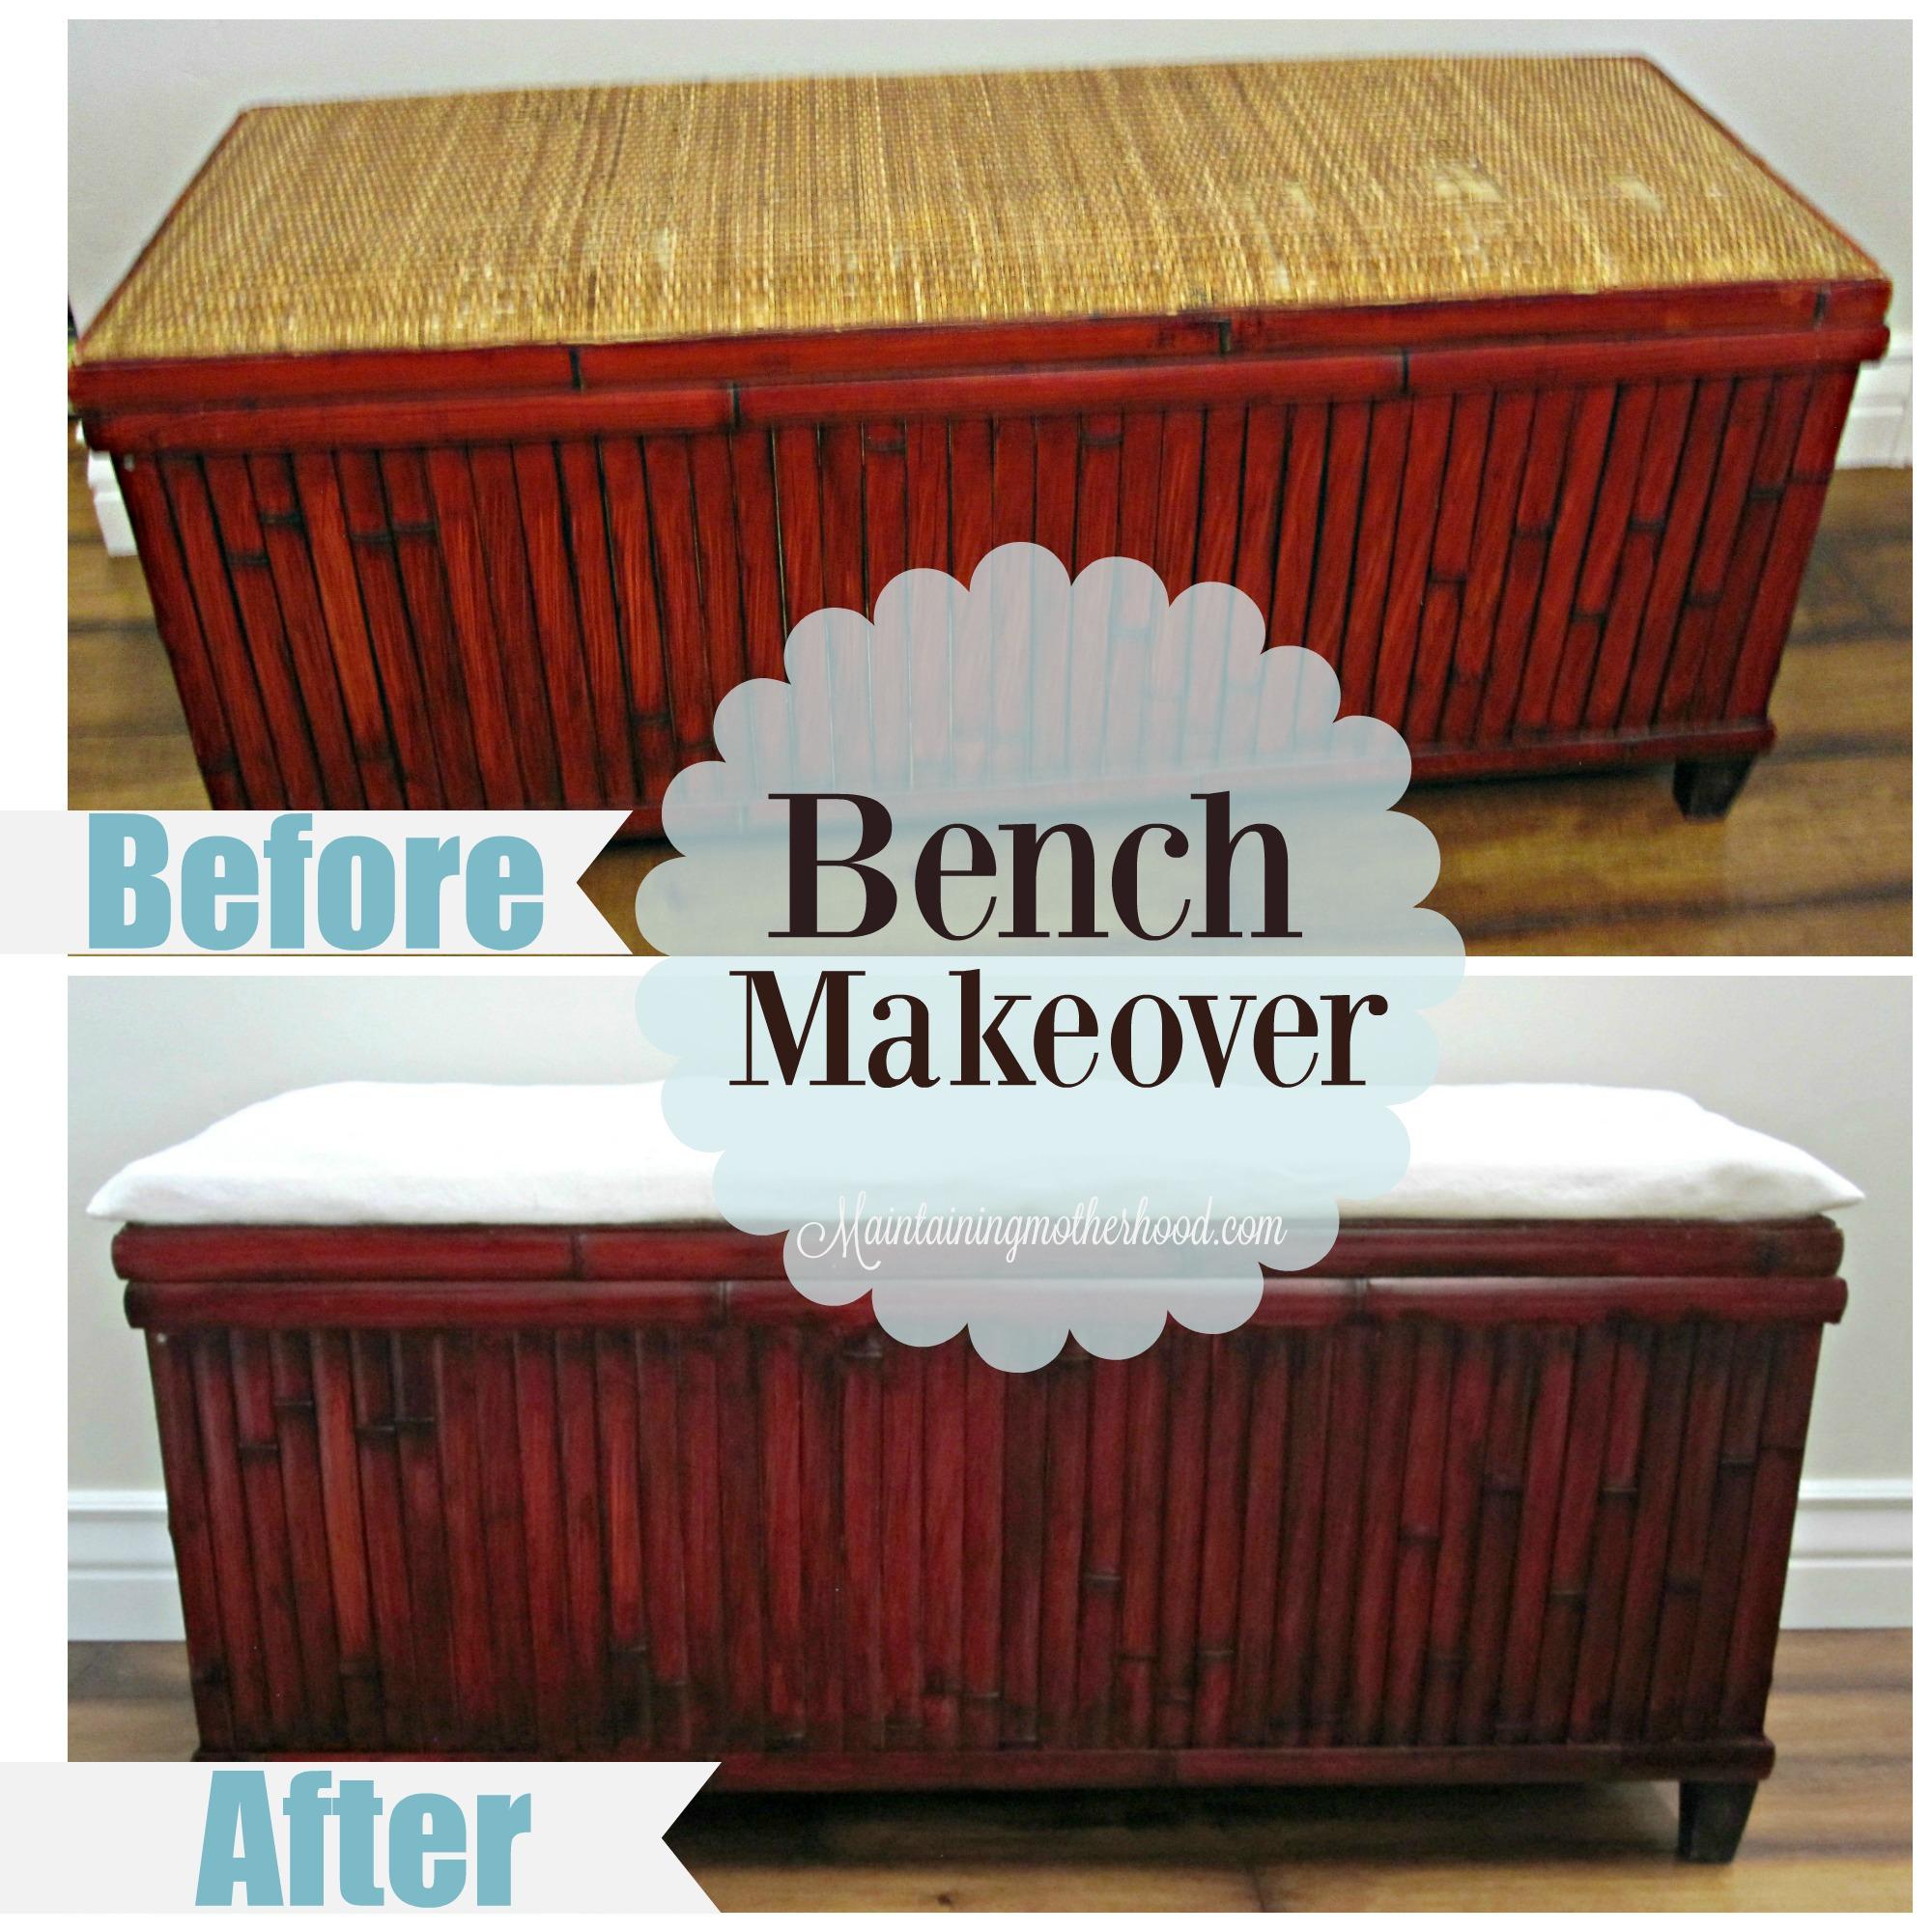 Bench makeover